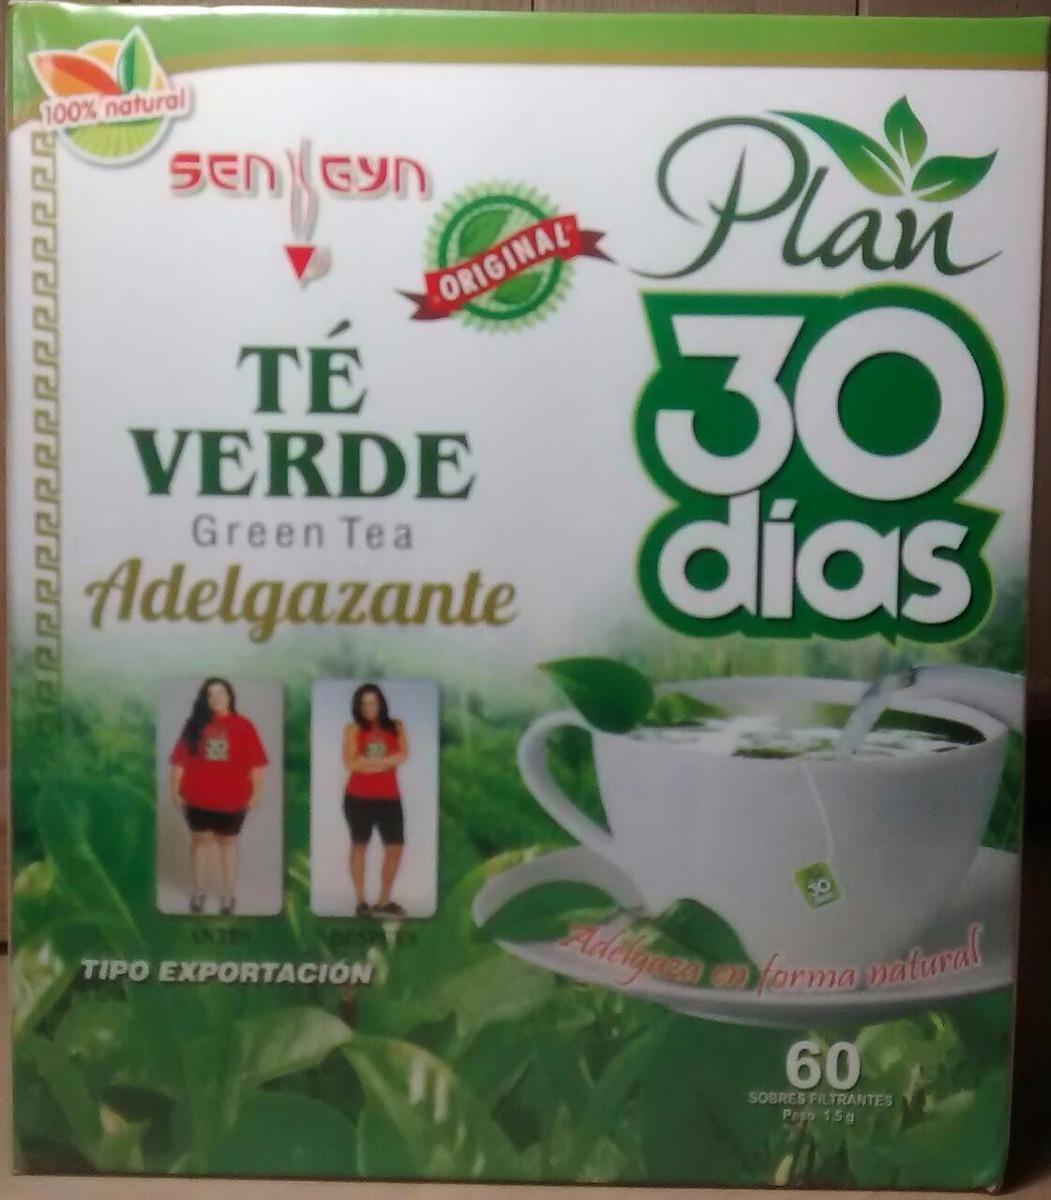 Té Verde Adelgazante Plan 30 Días - Rejuvenece La Piel - S